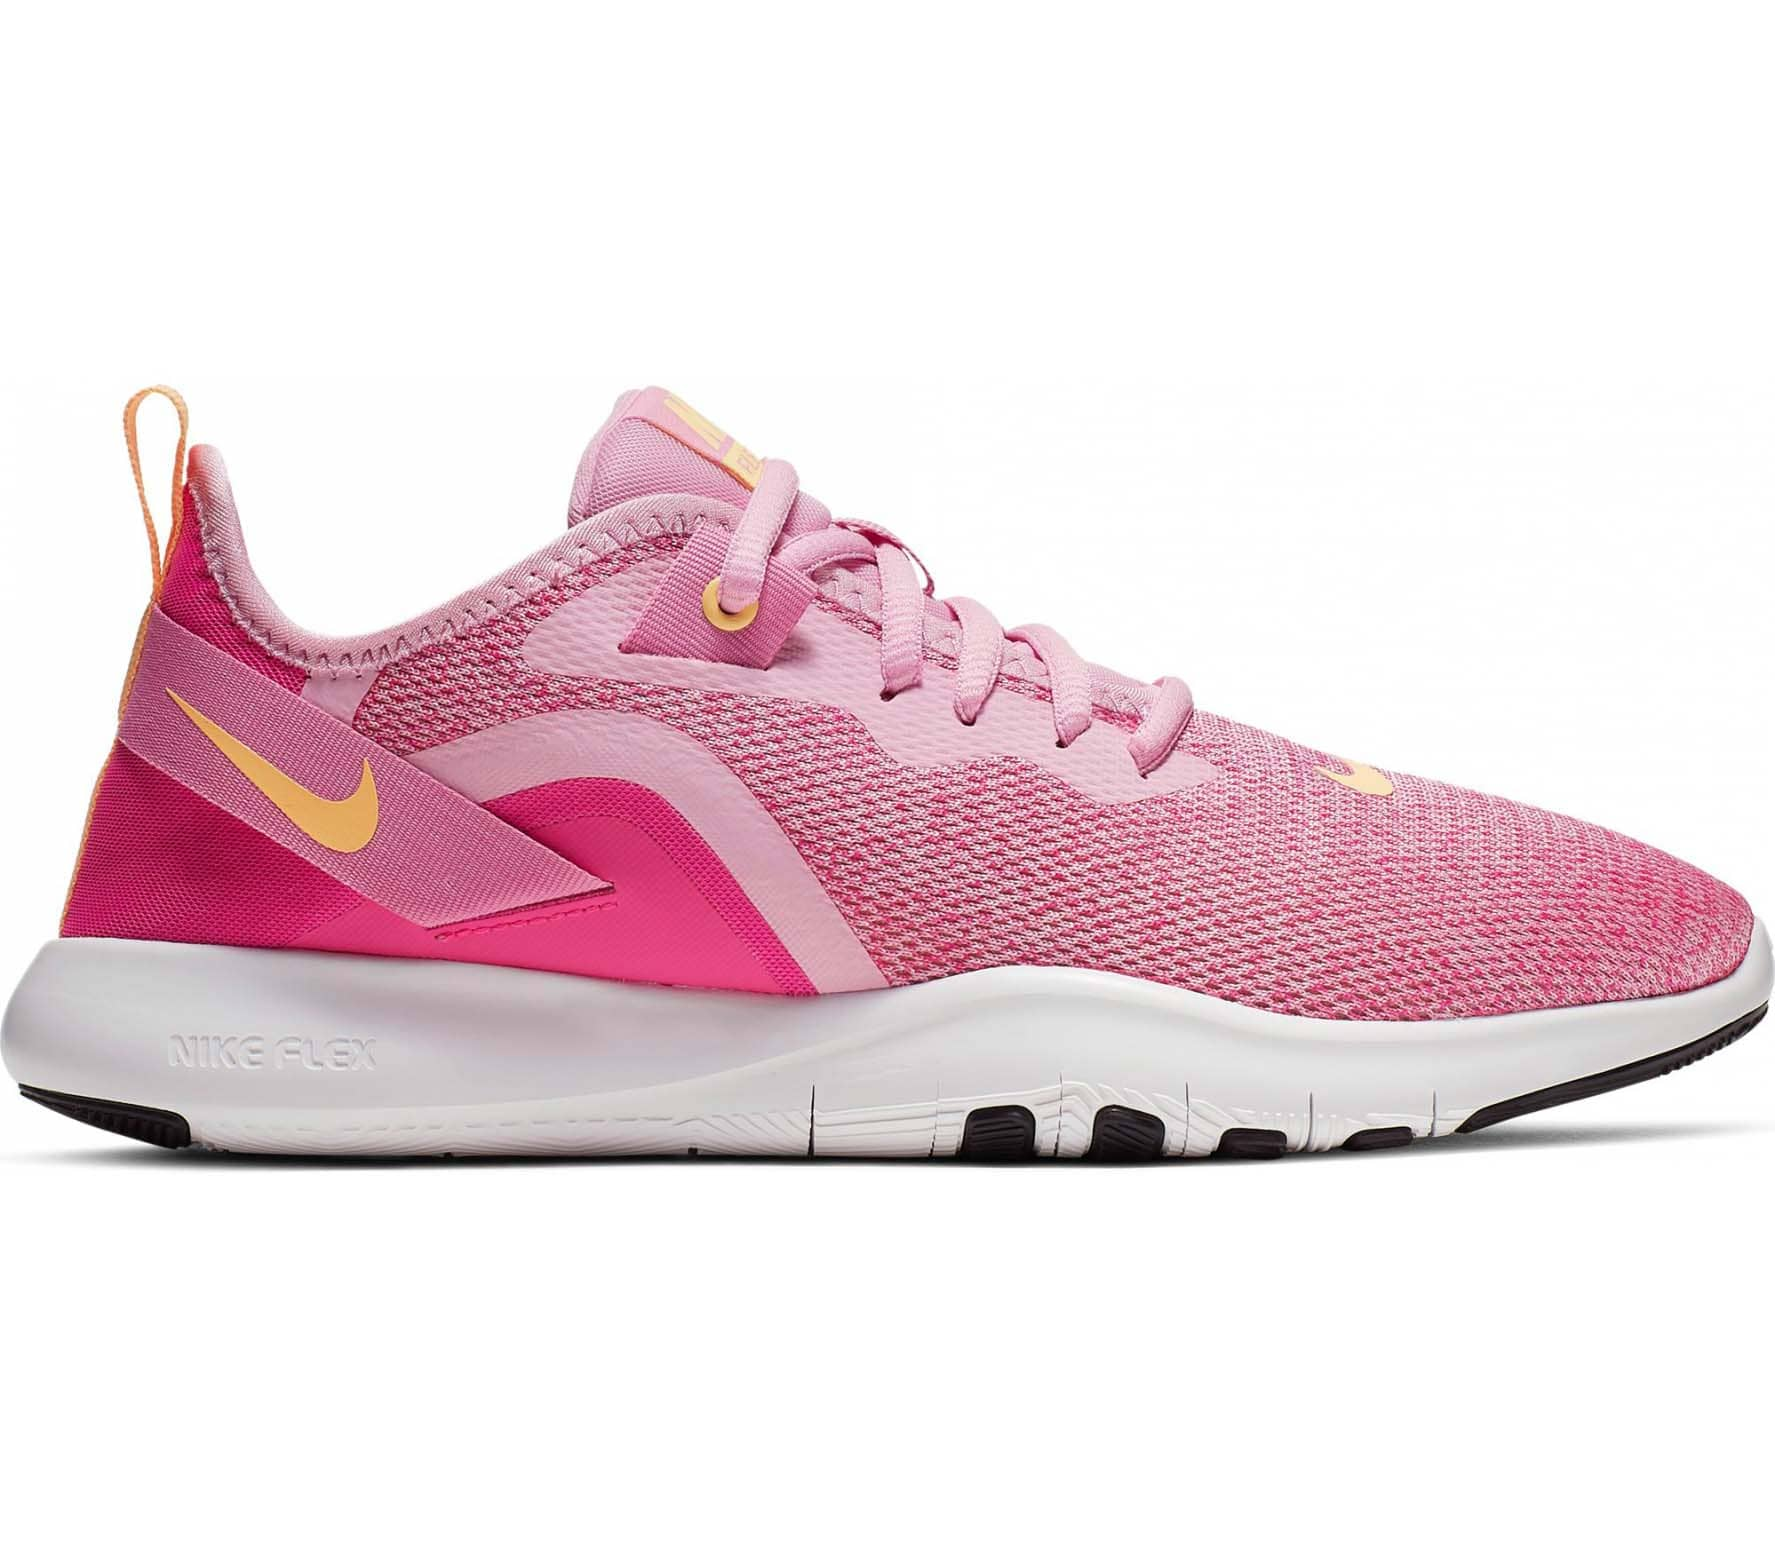 Roze damesschoenen Nike Flex Trainer 9 - AQ7491 600